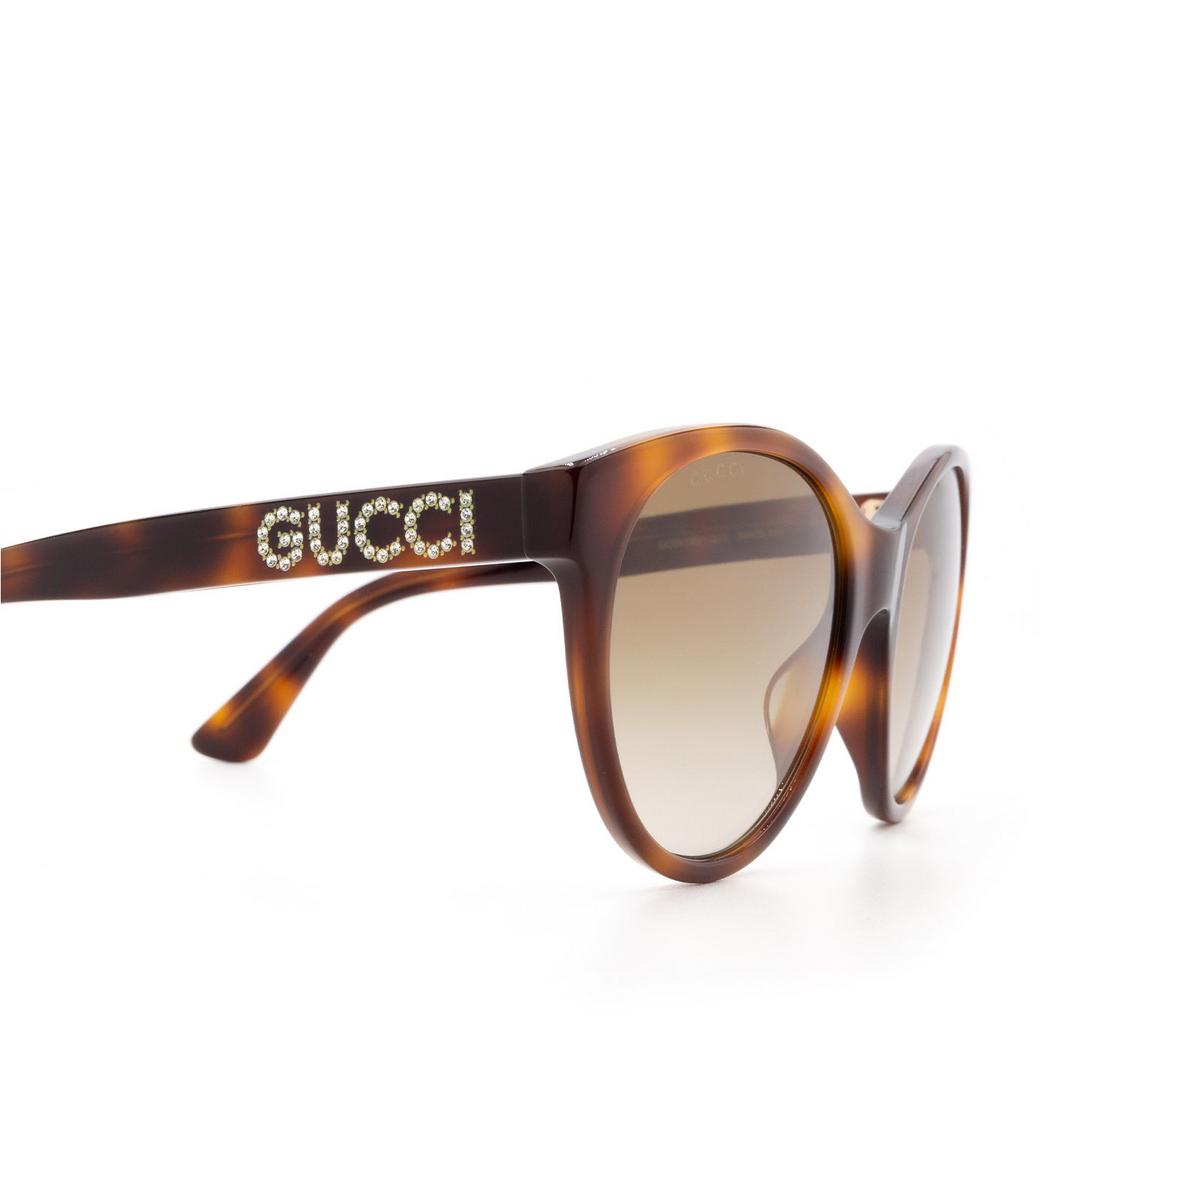 Gucci® Cat-eye Sunglasses: GG0419S color Havana 003 - 3/3.